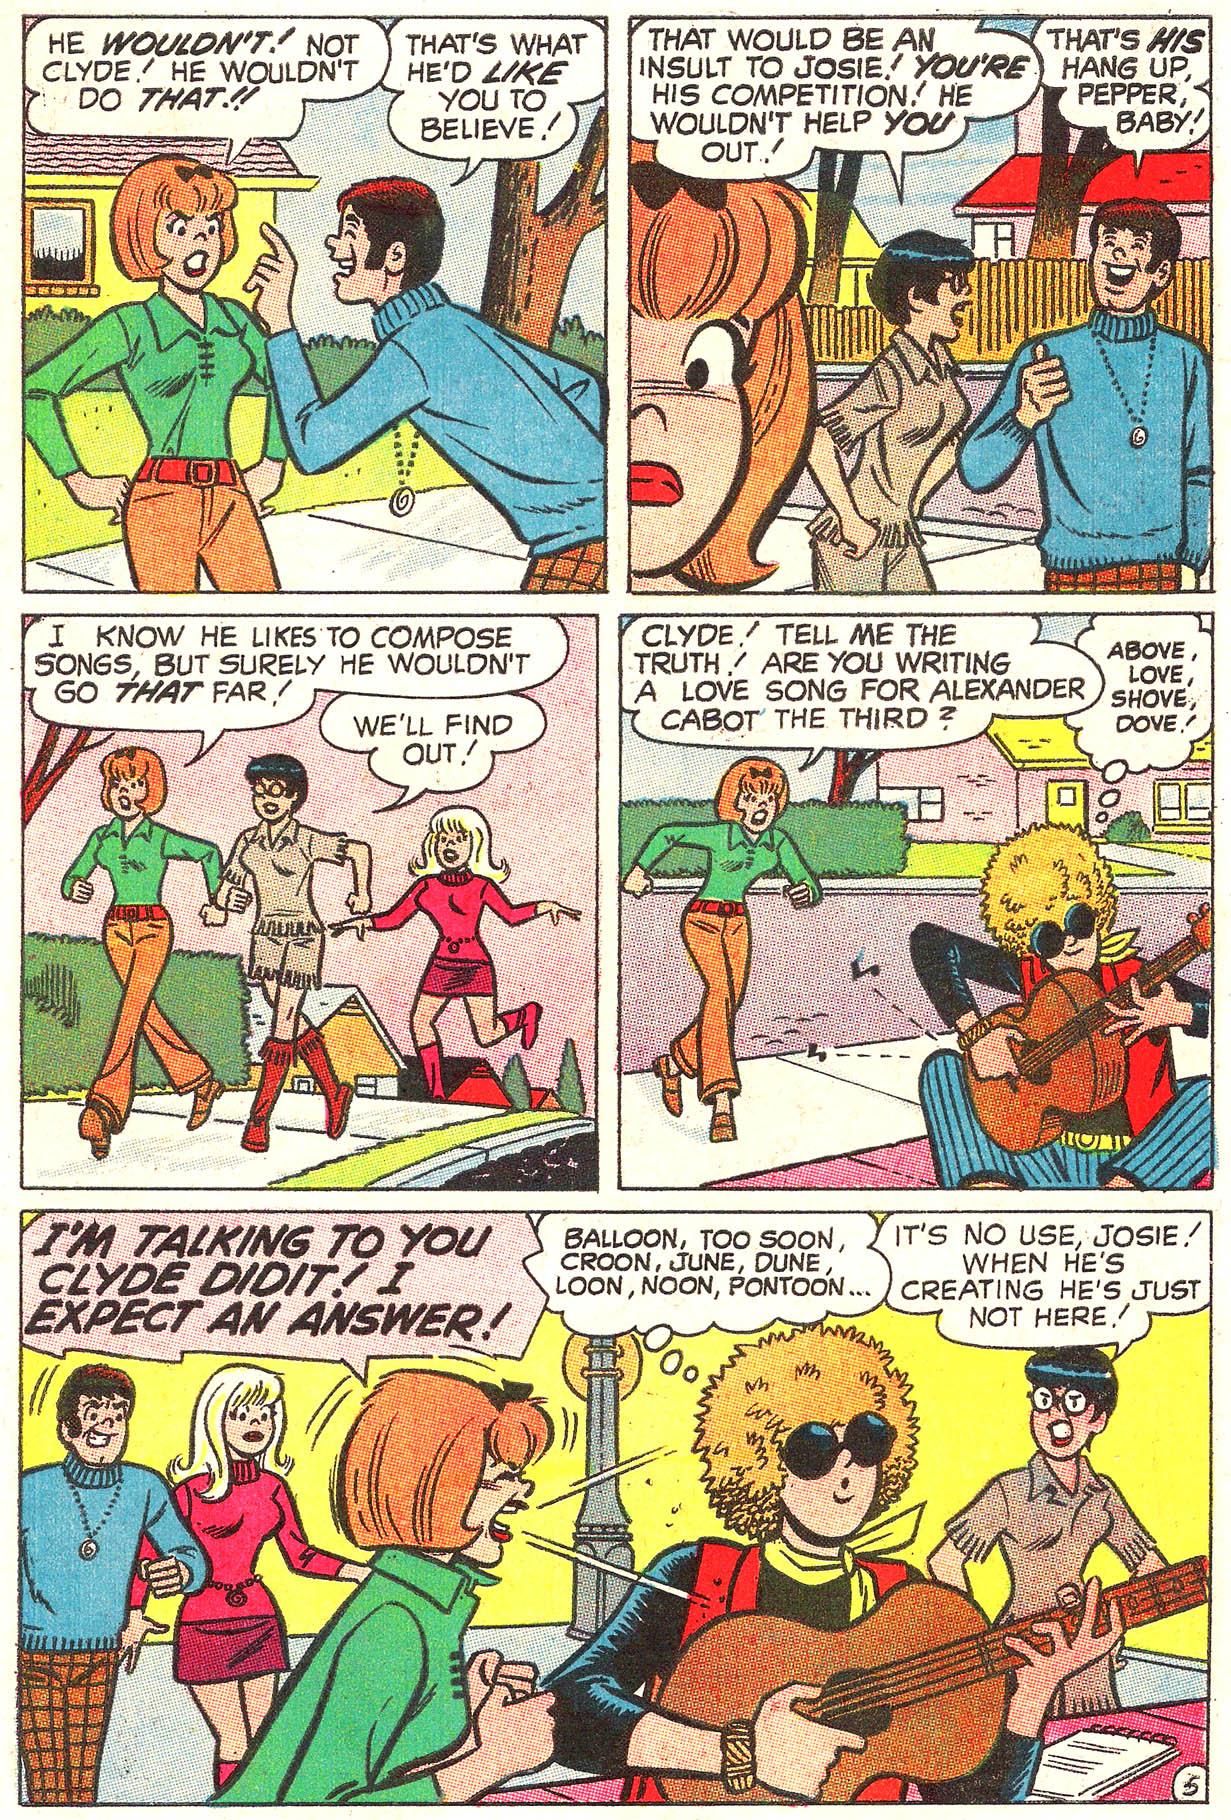 Read online She's Josie comic -  Issue #41 - 7